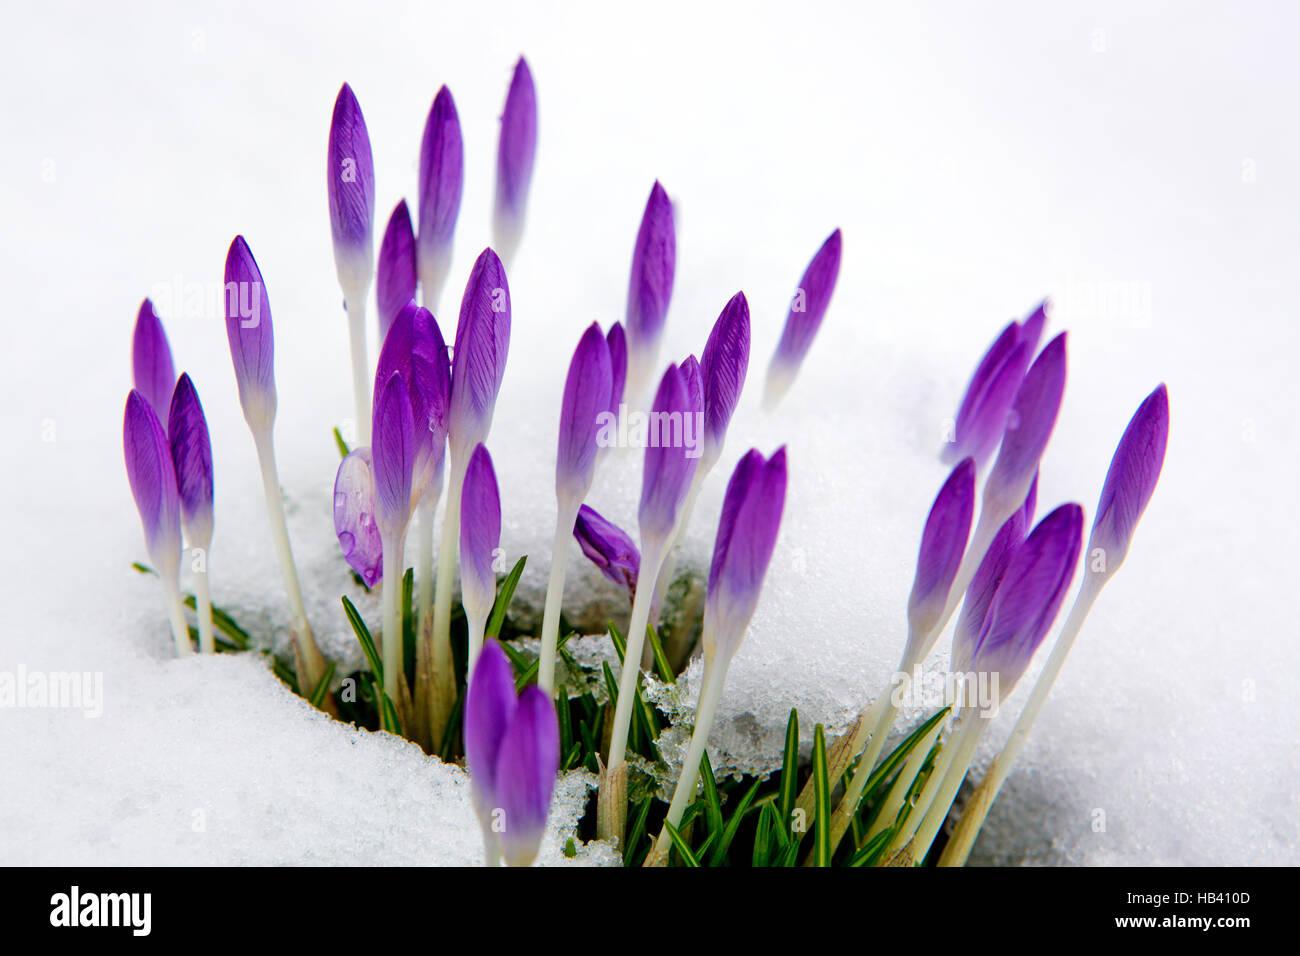 Violet crocuses in snow. Stock Photo